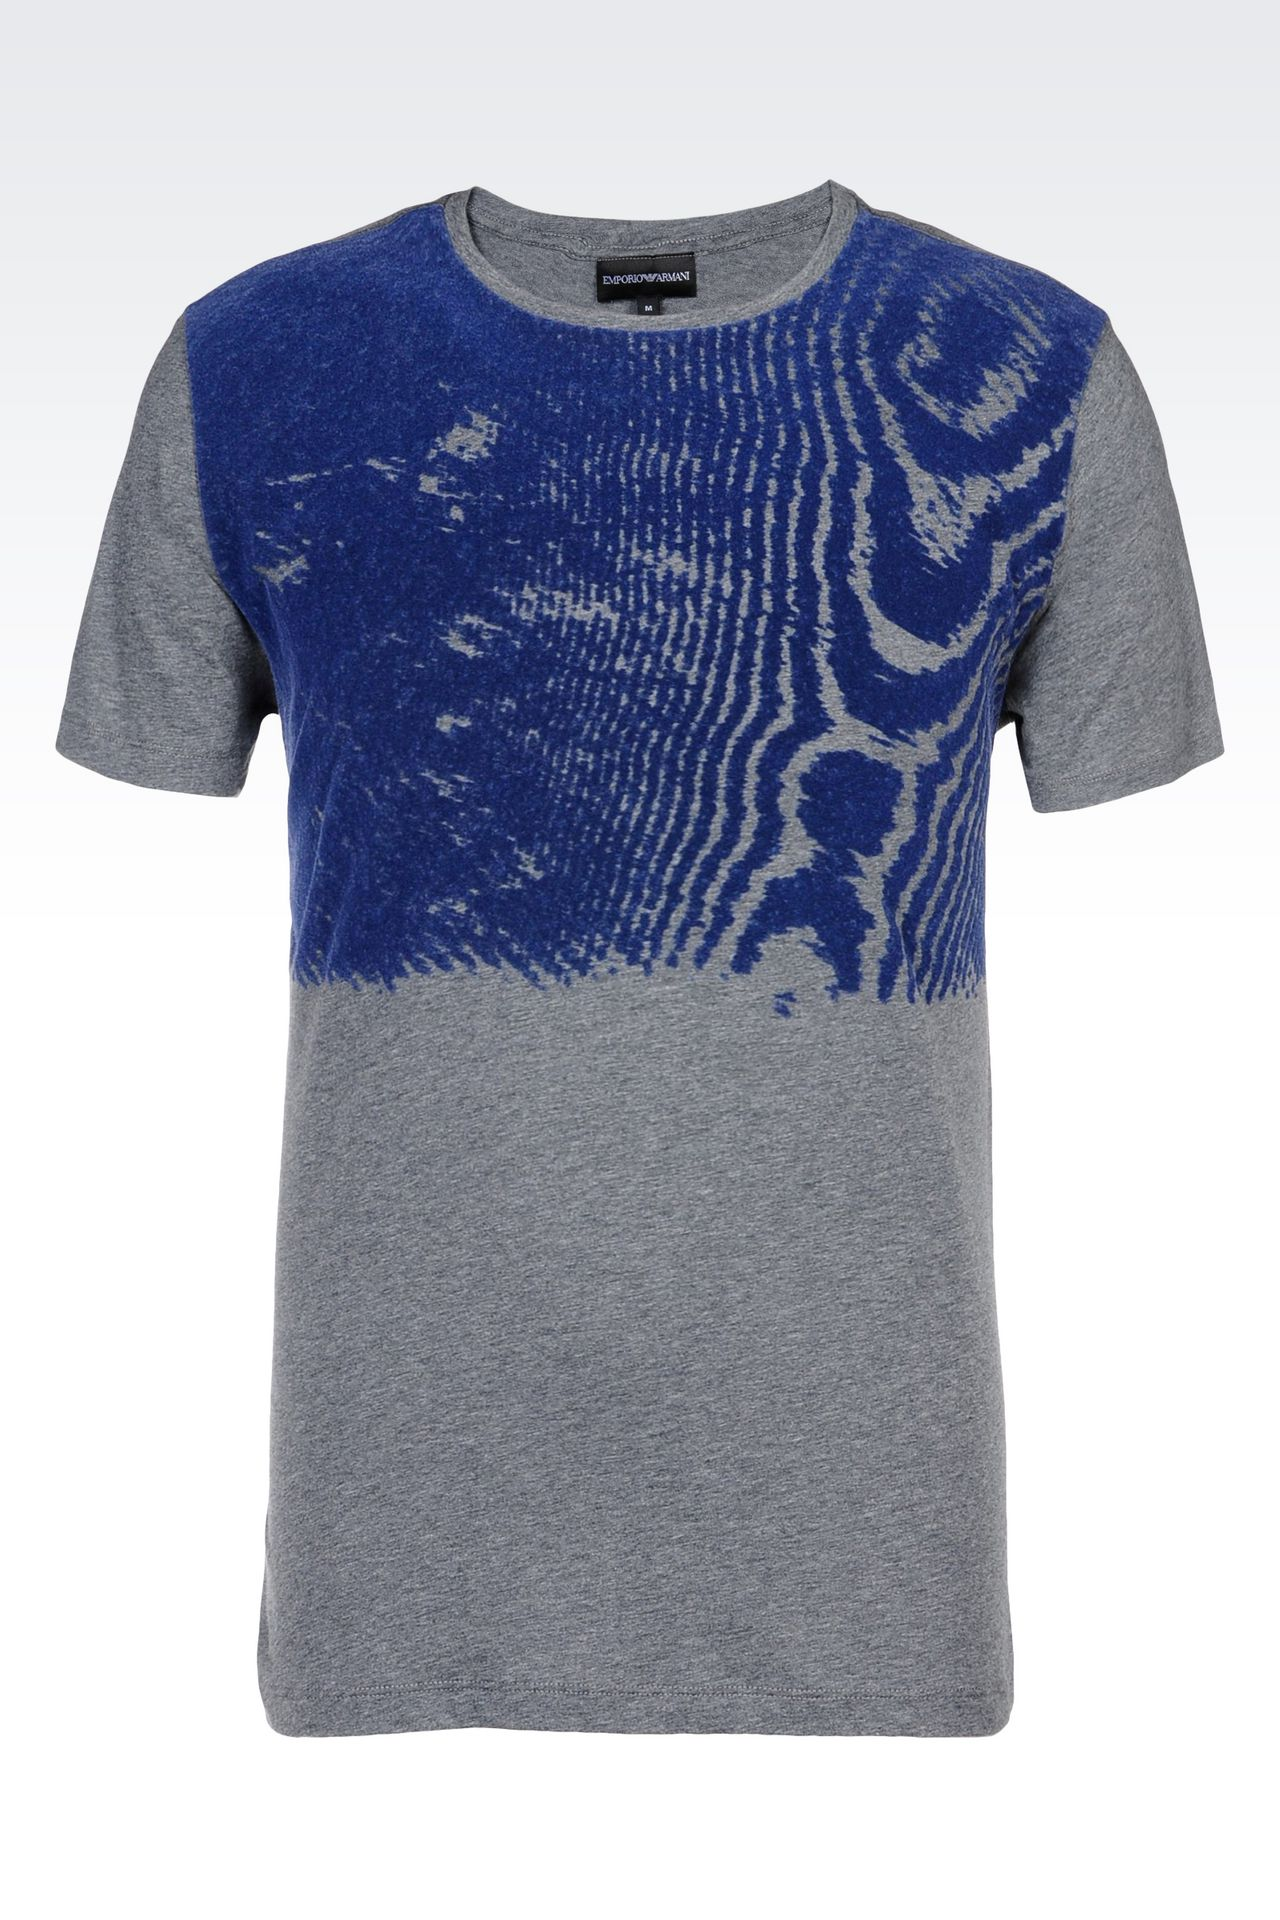 emporio armani men cotton t shirt with flock print. Black Bedroom Furniture Sets. Home Design Ideas